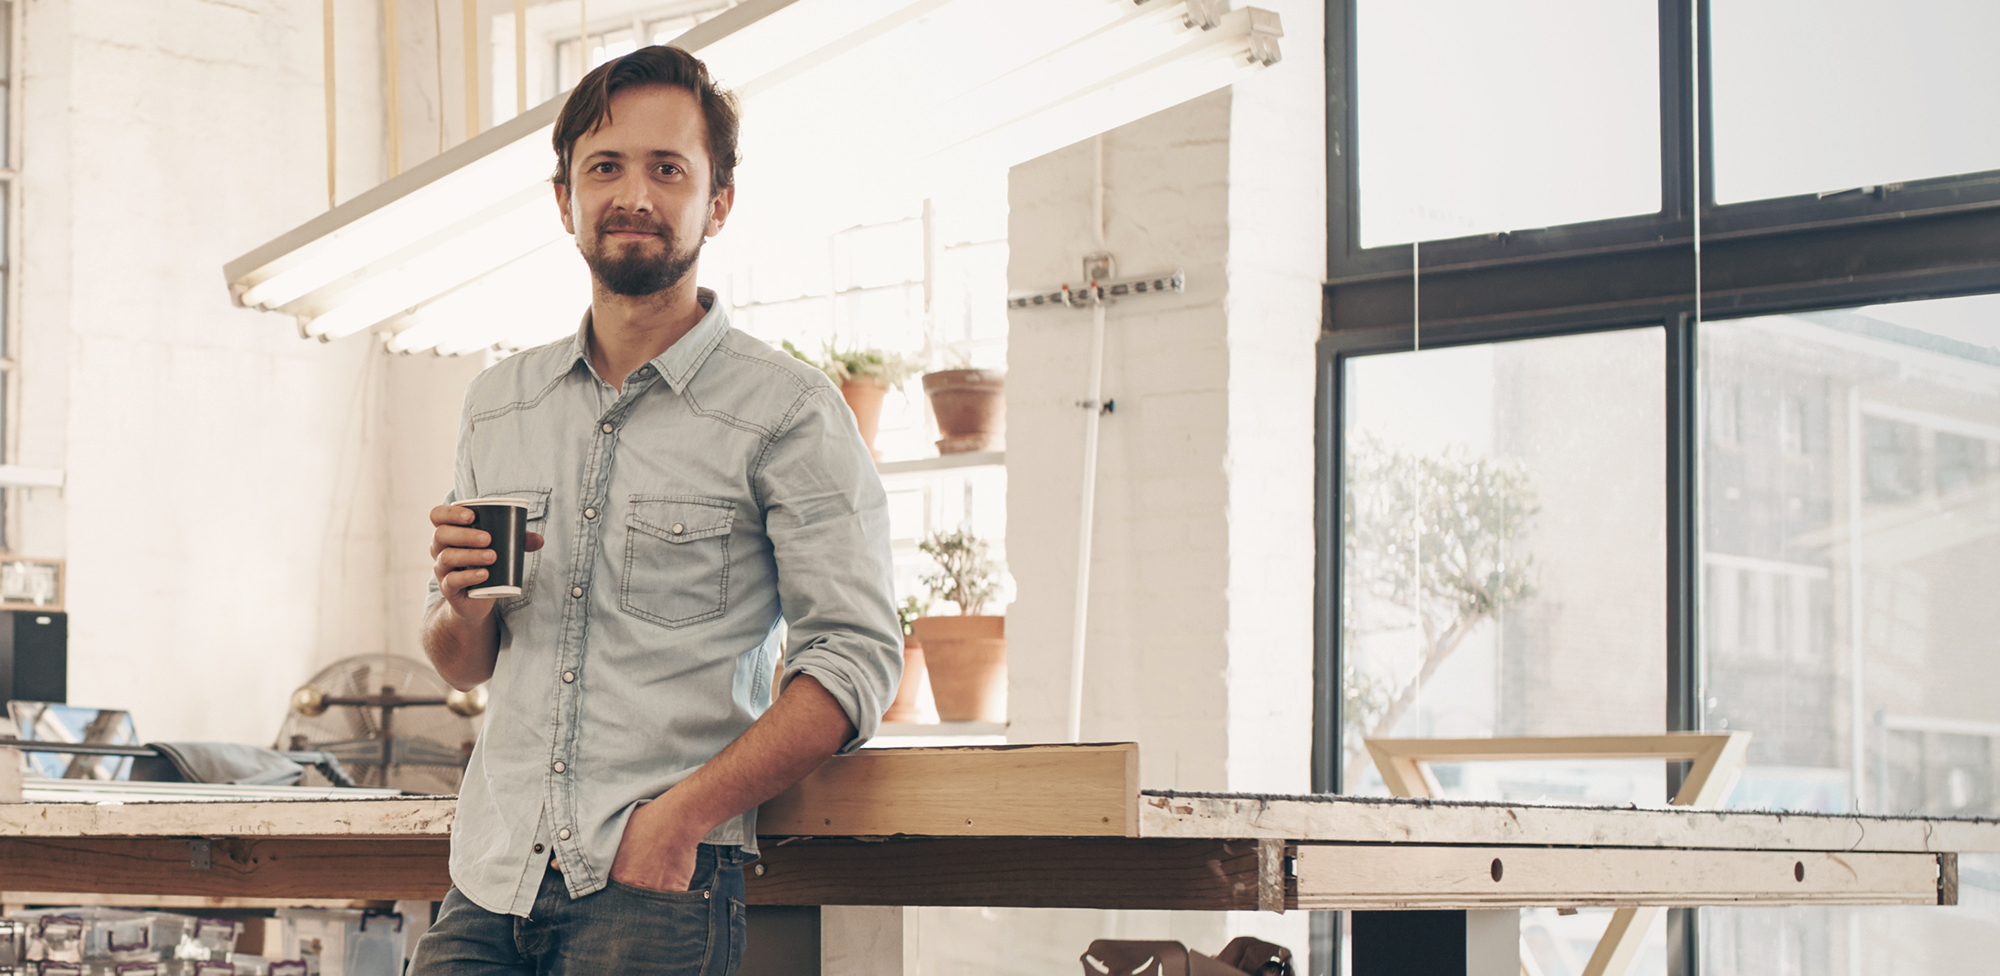 man inside kitchen holding coffee mug smiling